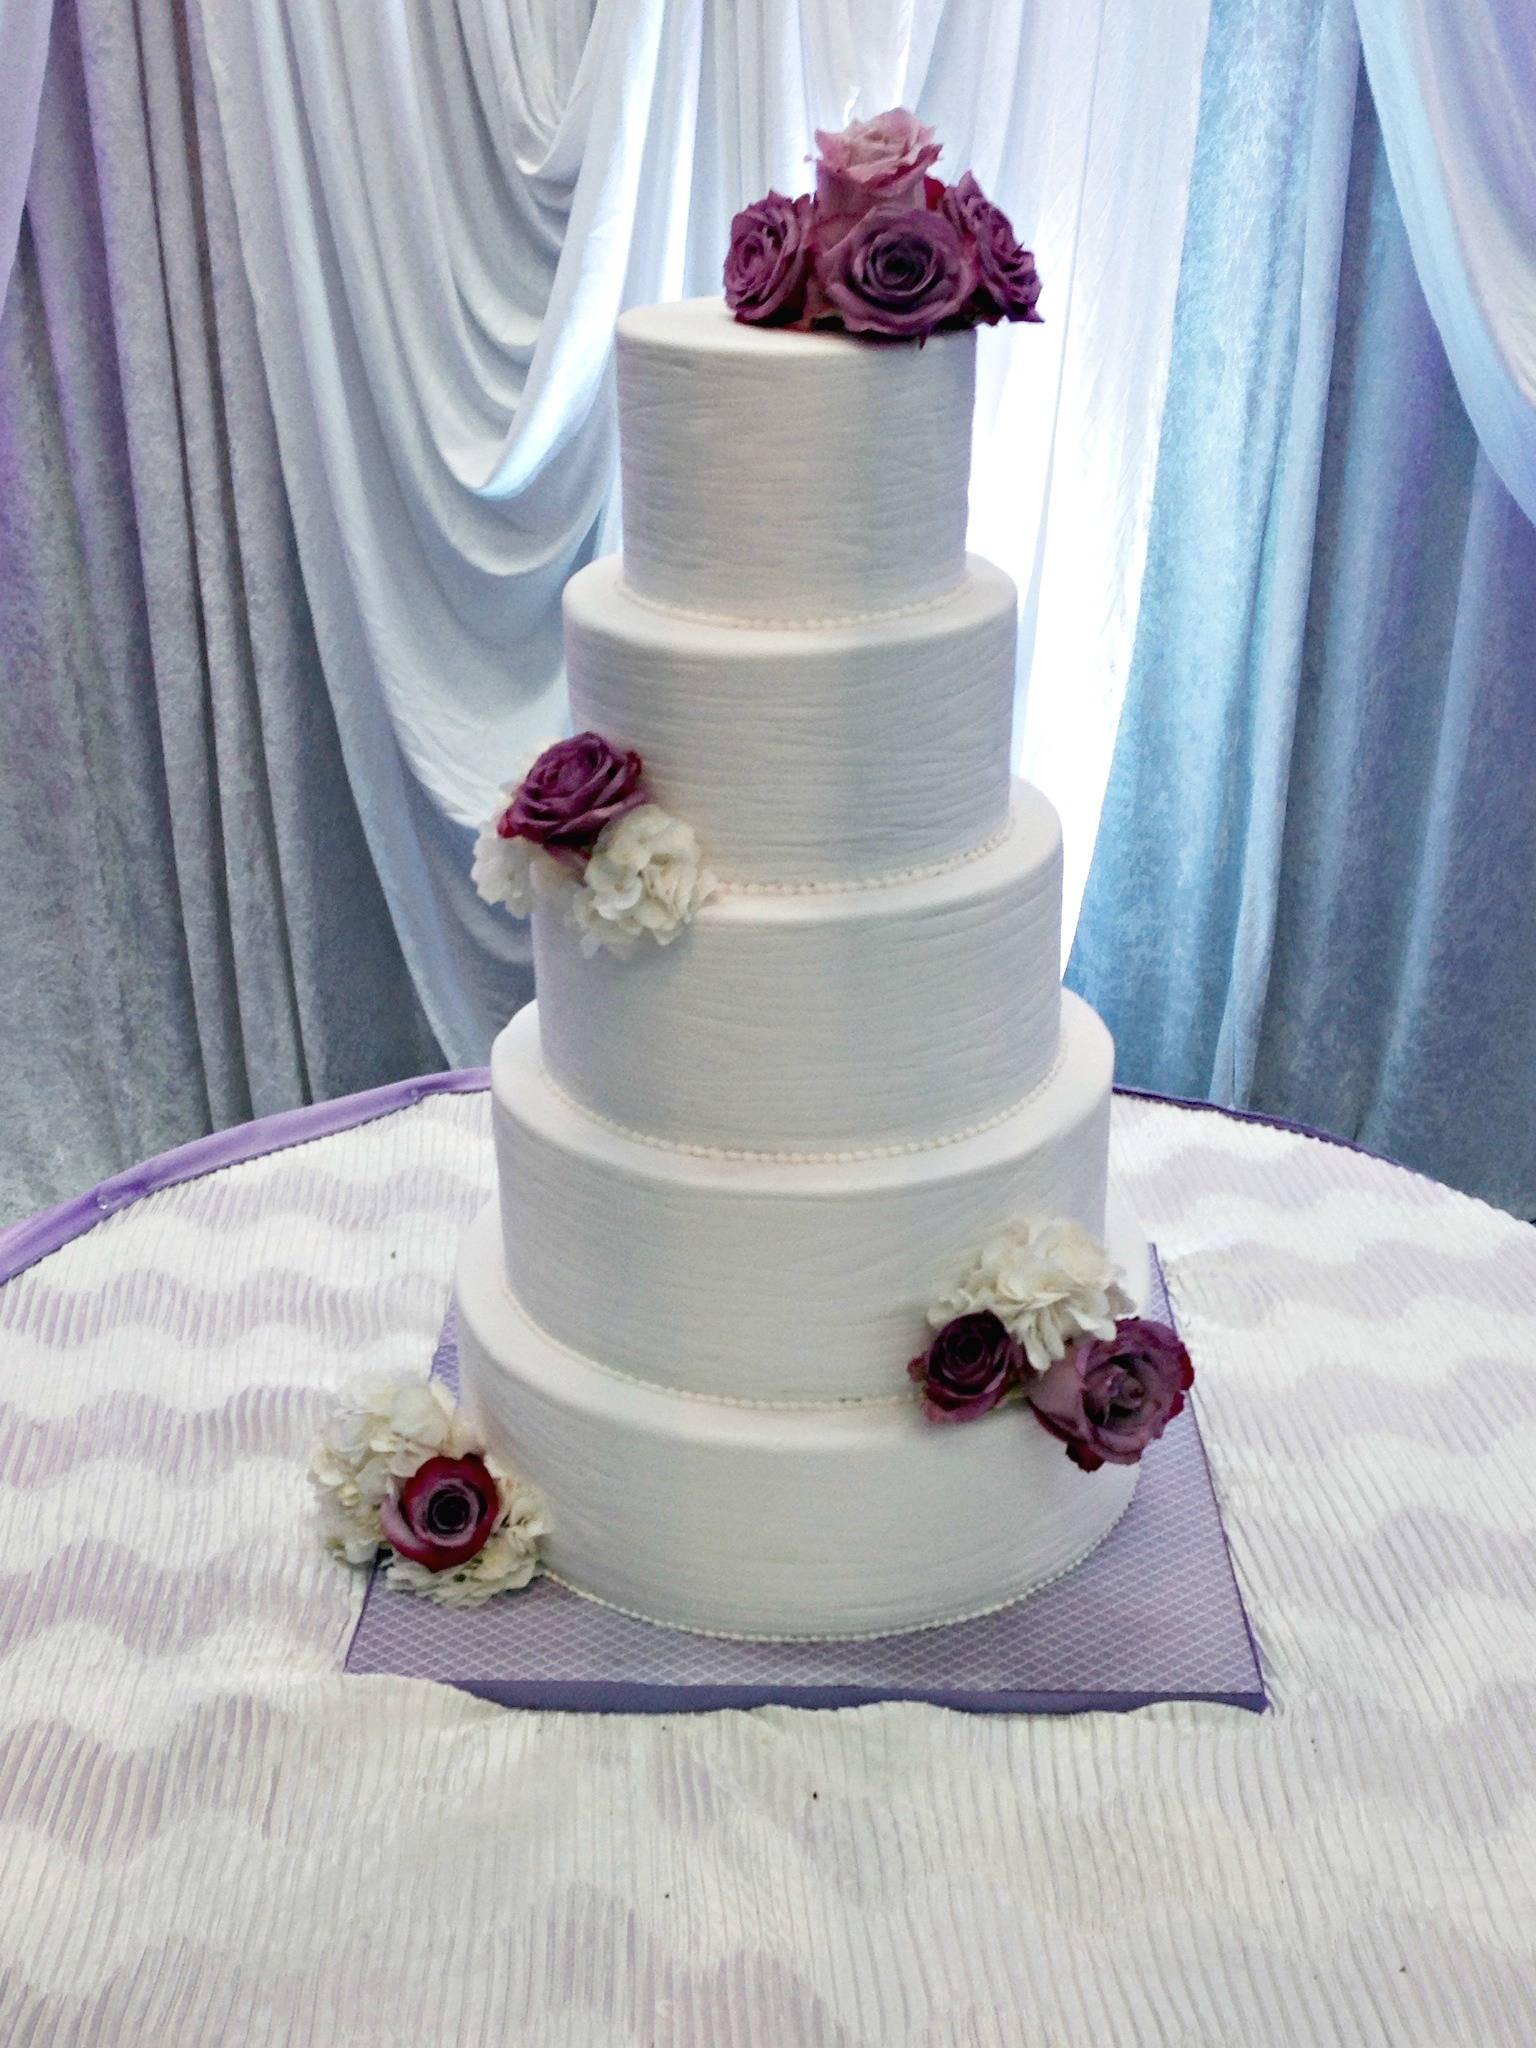 Textured Fondant cake